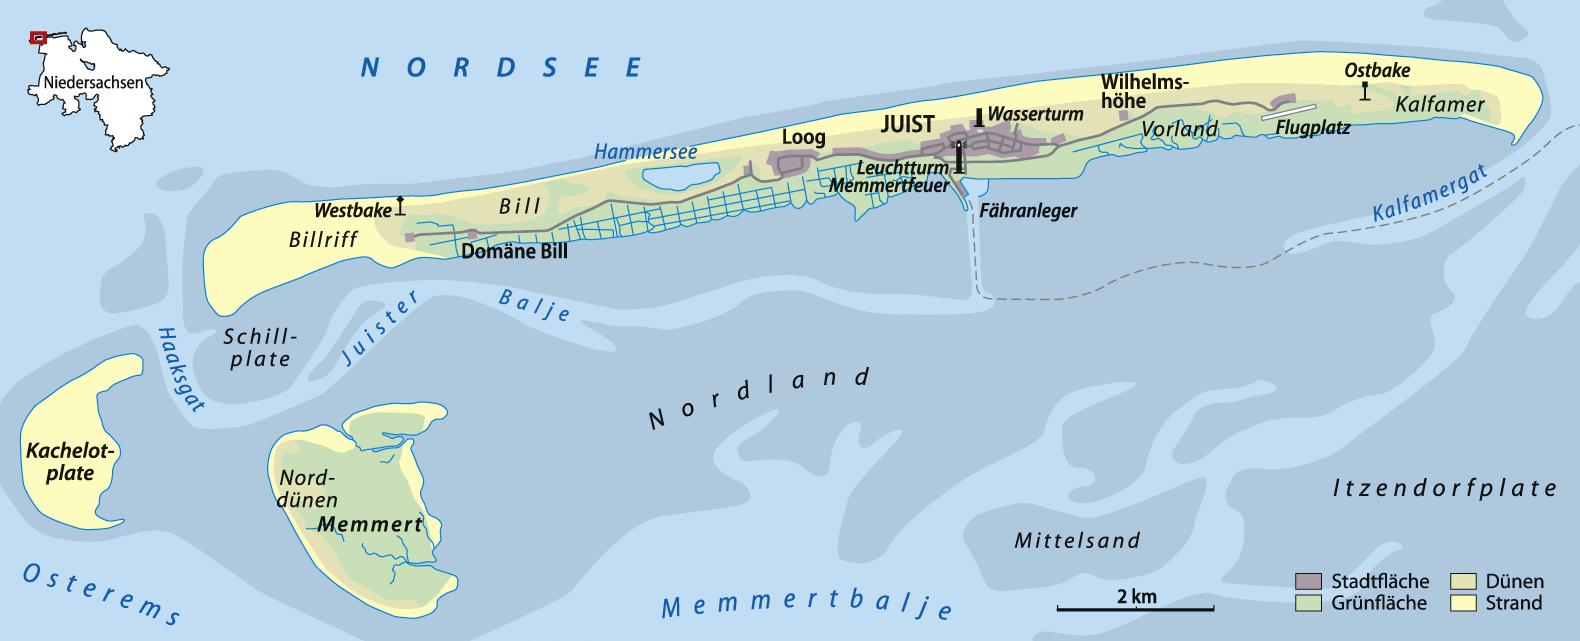 Juist Karte.Vaizdas Karte Insel Juist Png Vikipedija